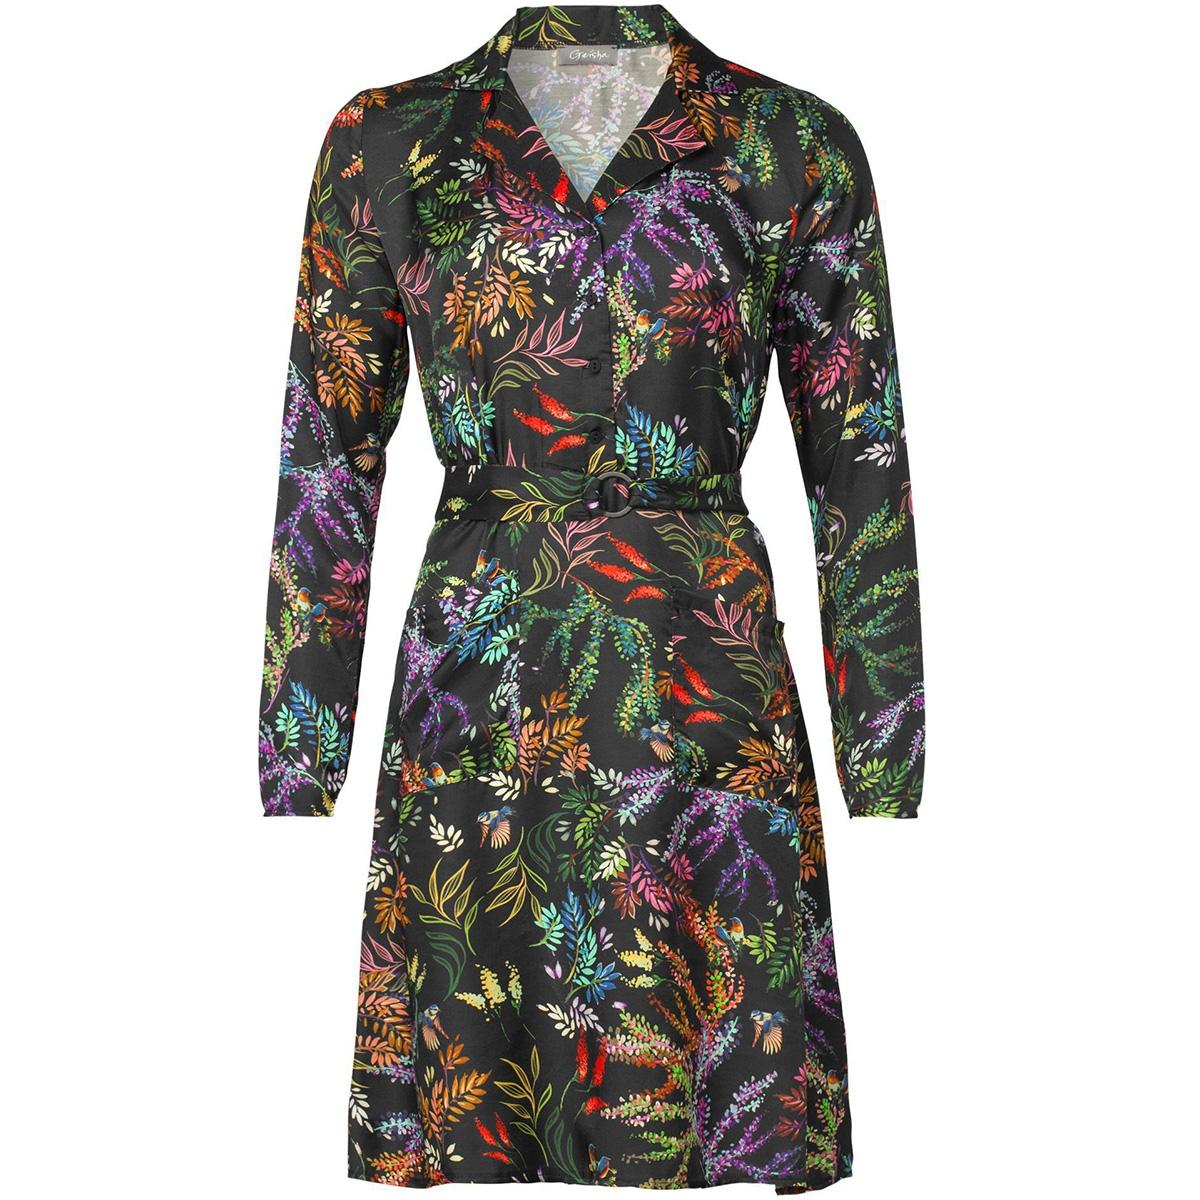 dress aop flower with strap 97827 20 geisha jurk 000999 black/multi color